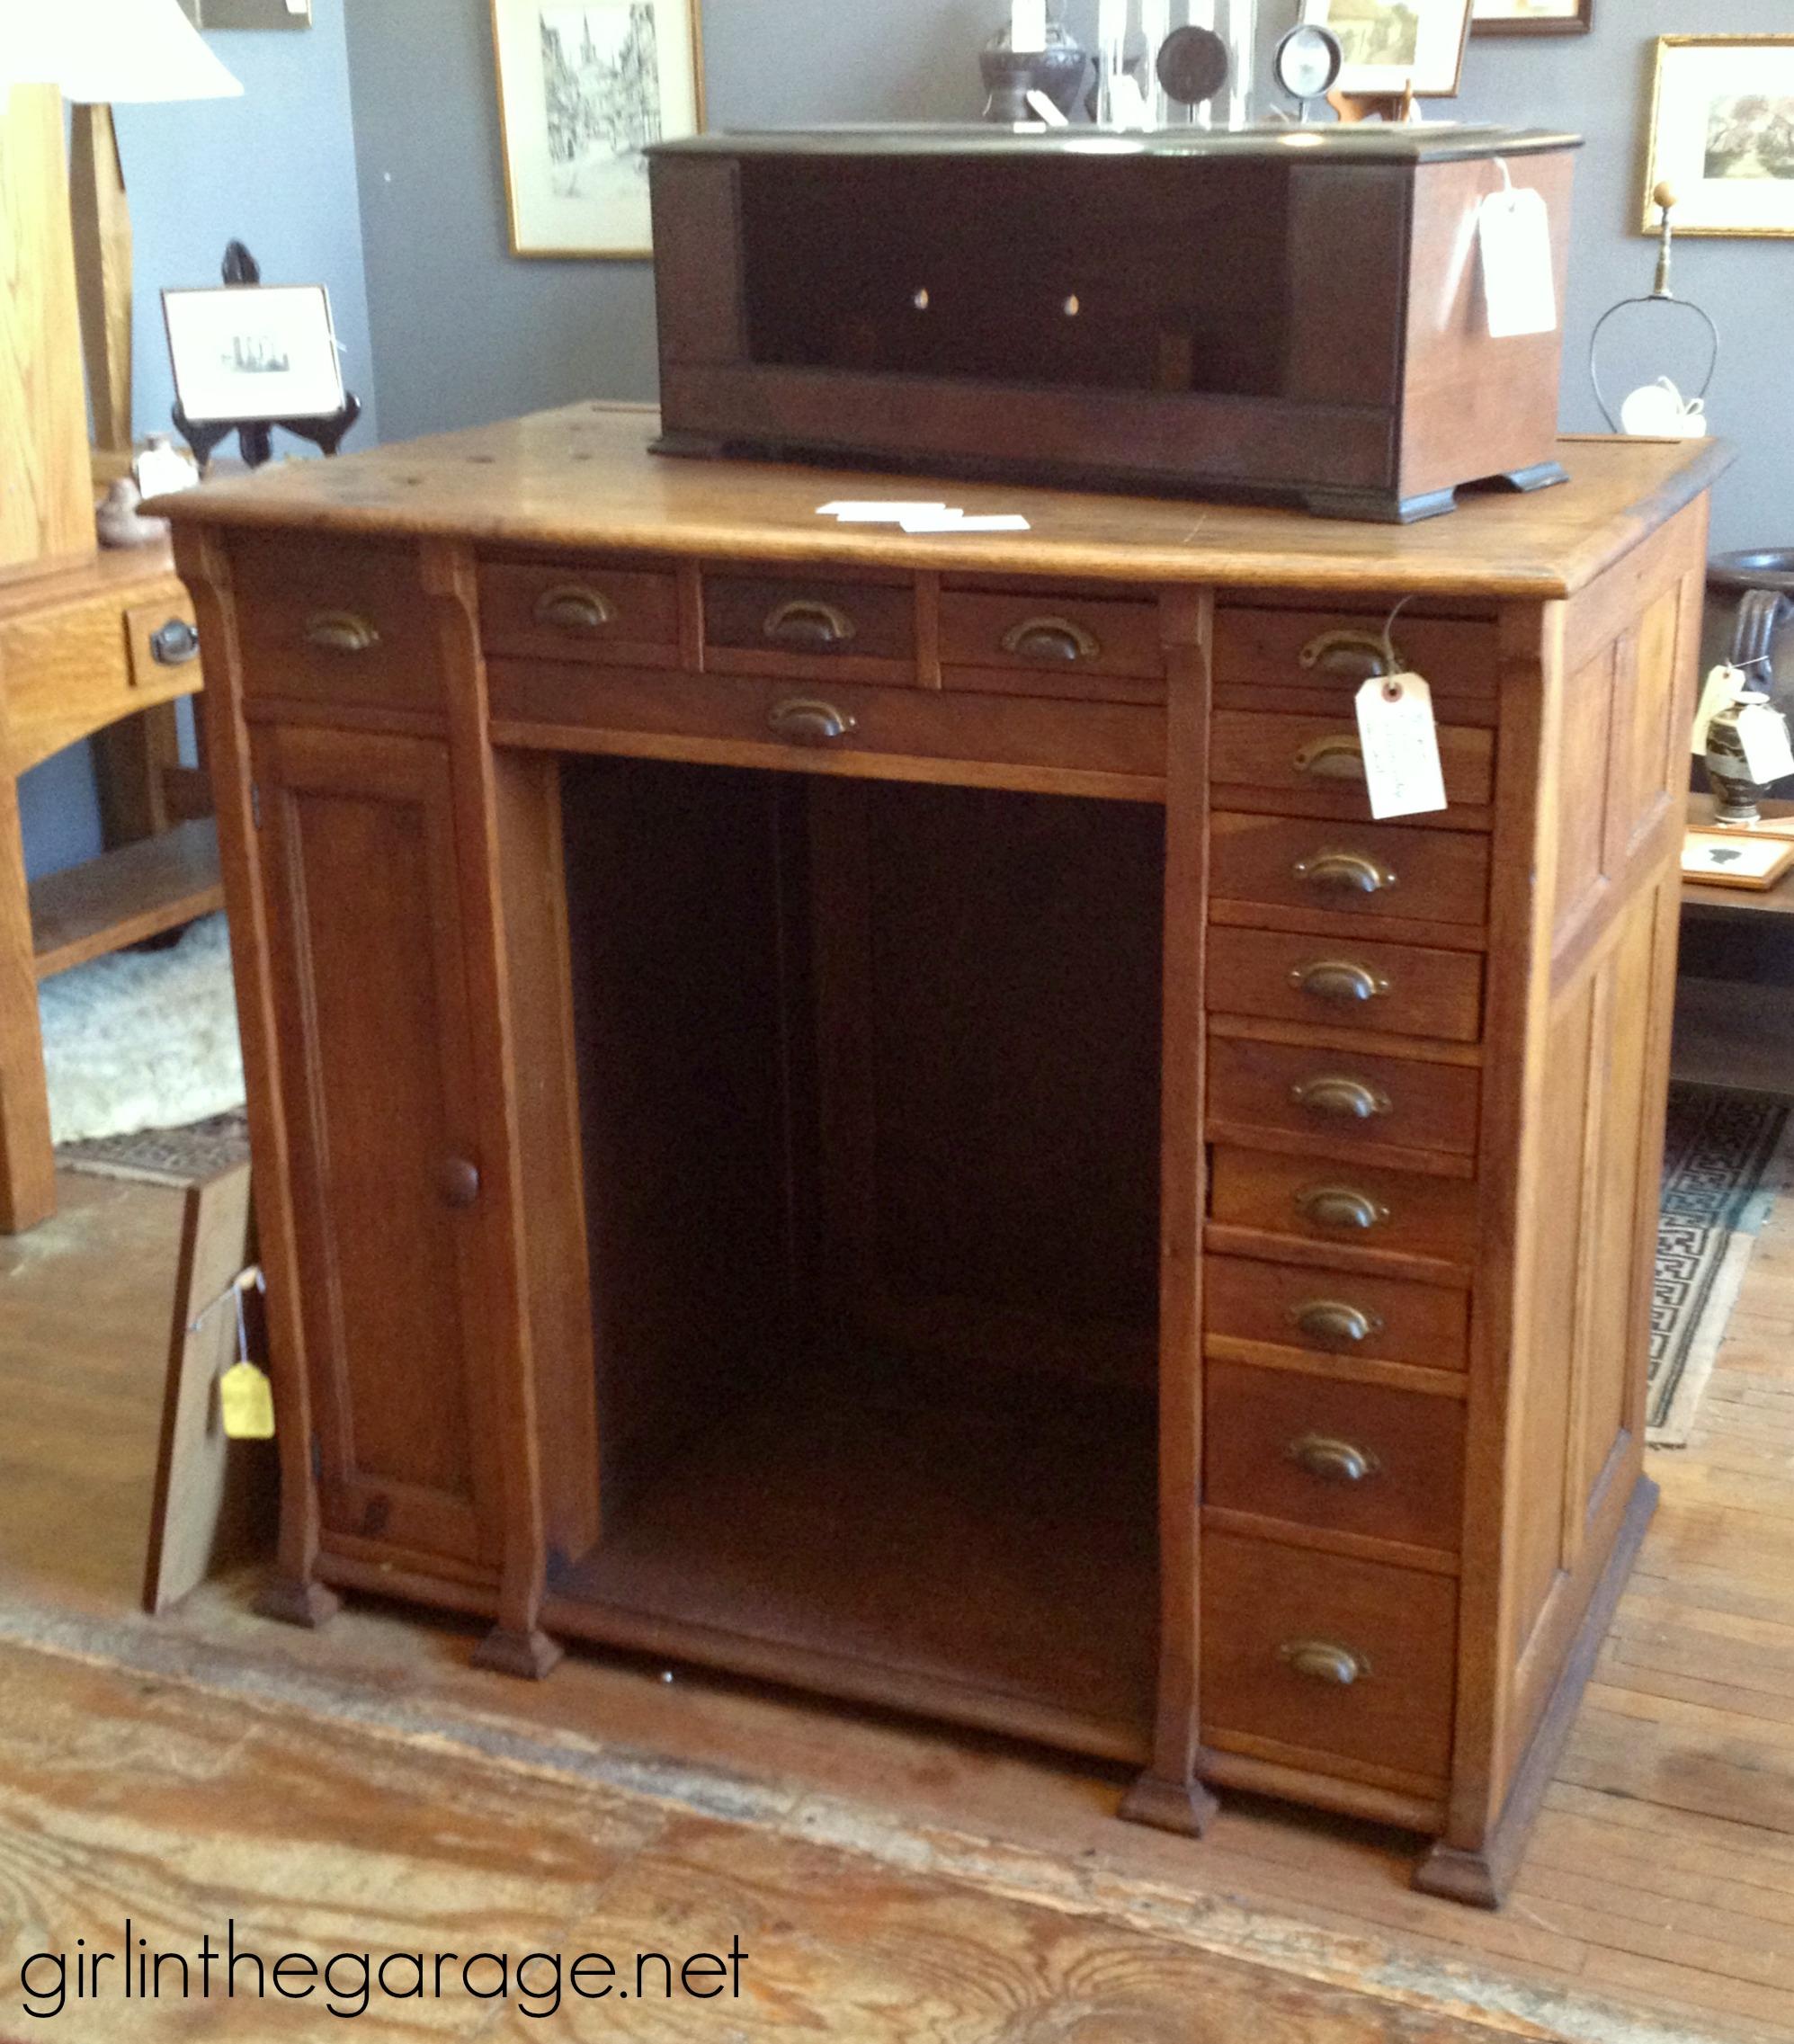 Img 2159 Midland Antique Wood Desk Drawers